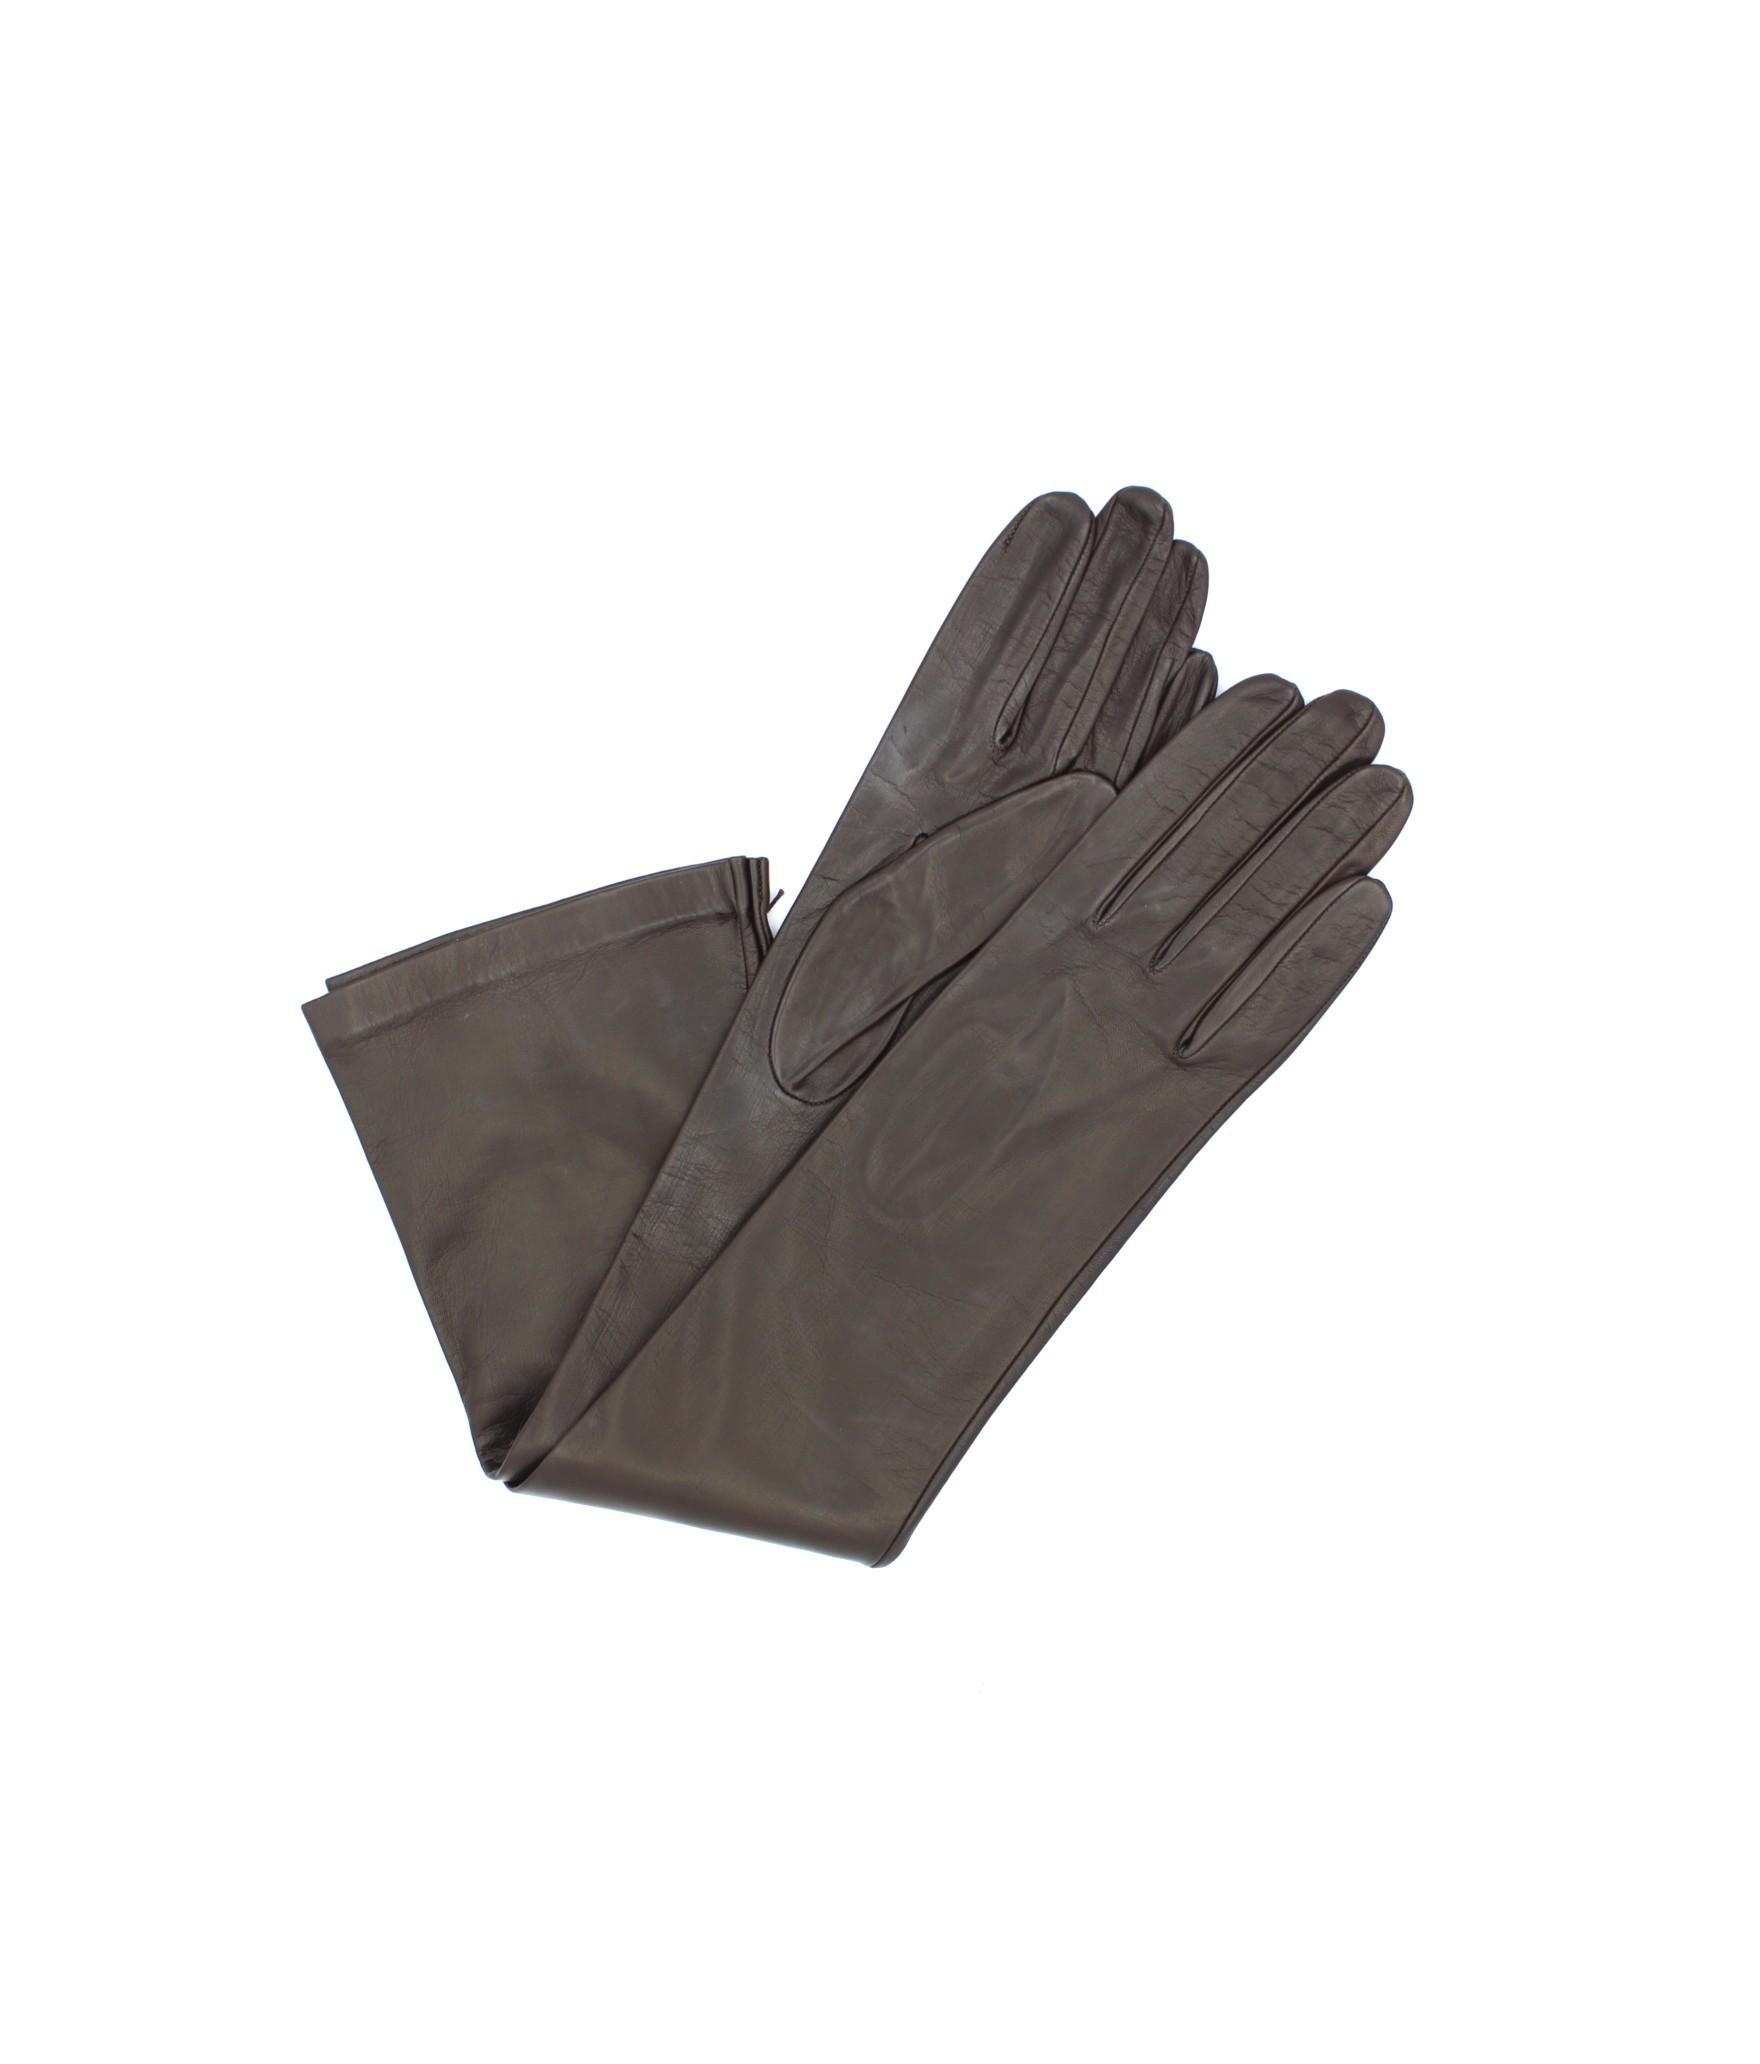 Nappa leather gloves 10bt silk lined Dark Brown Sermoneta